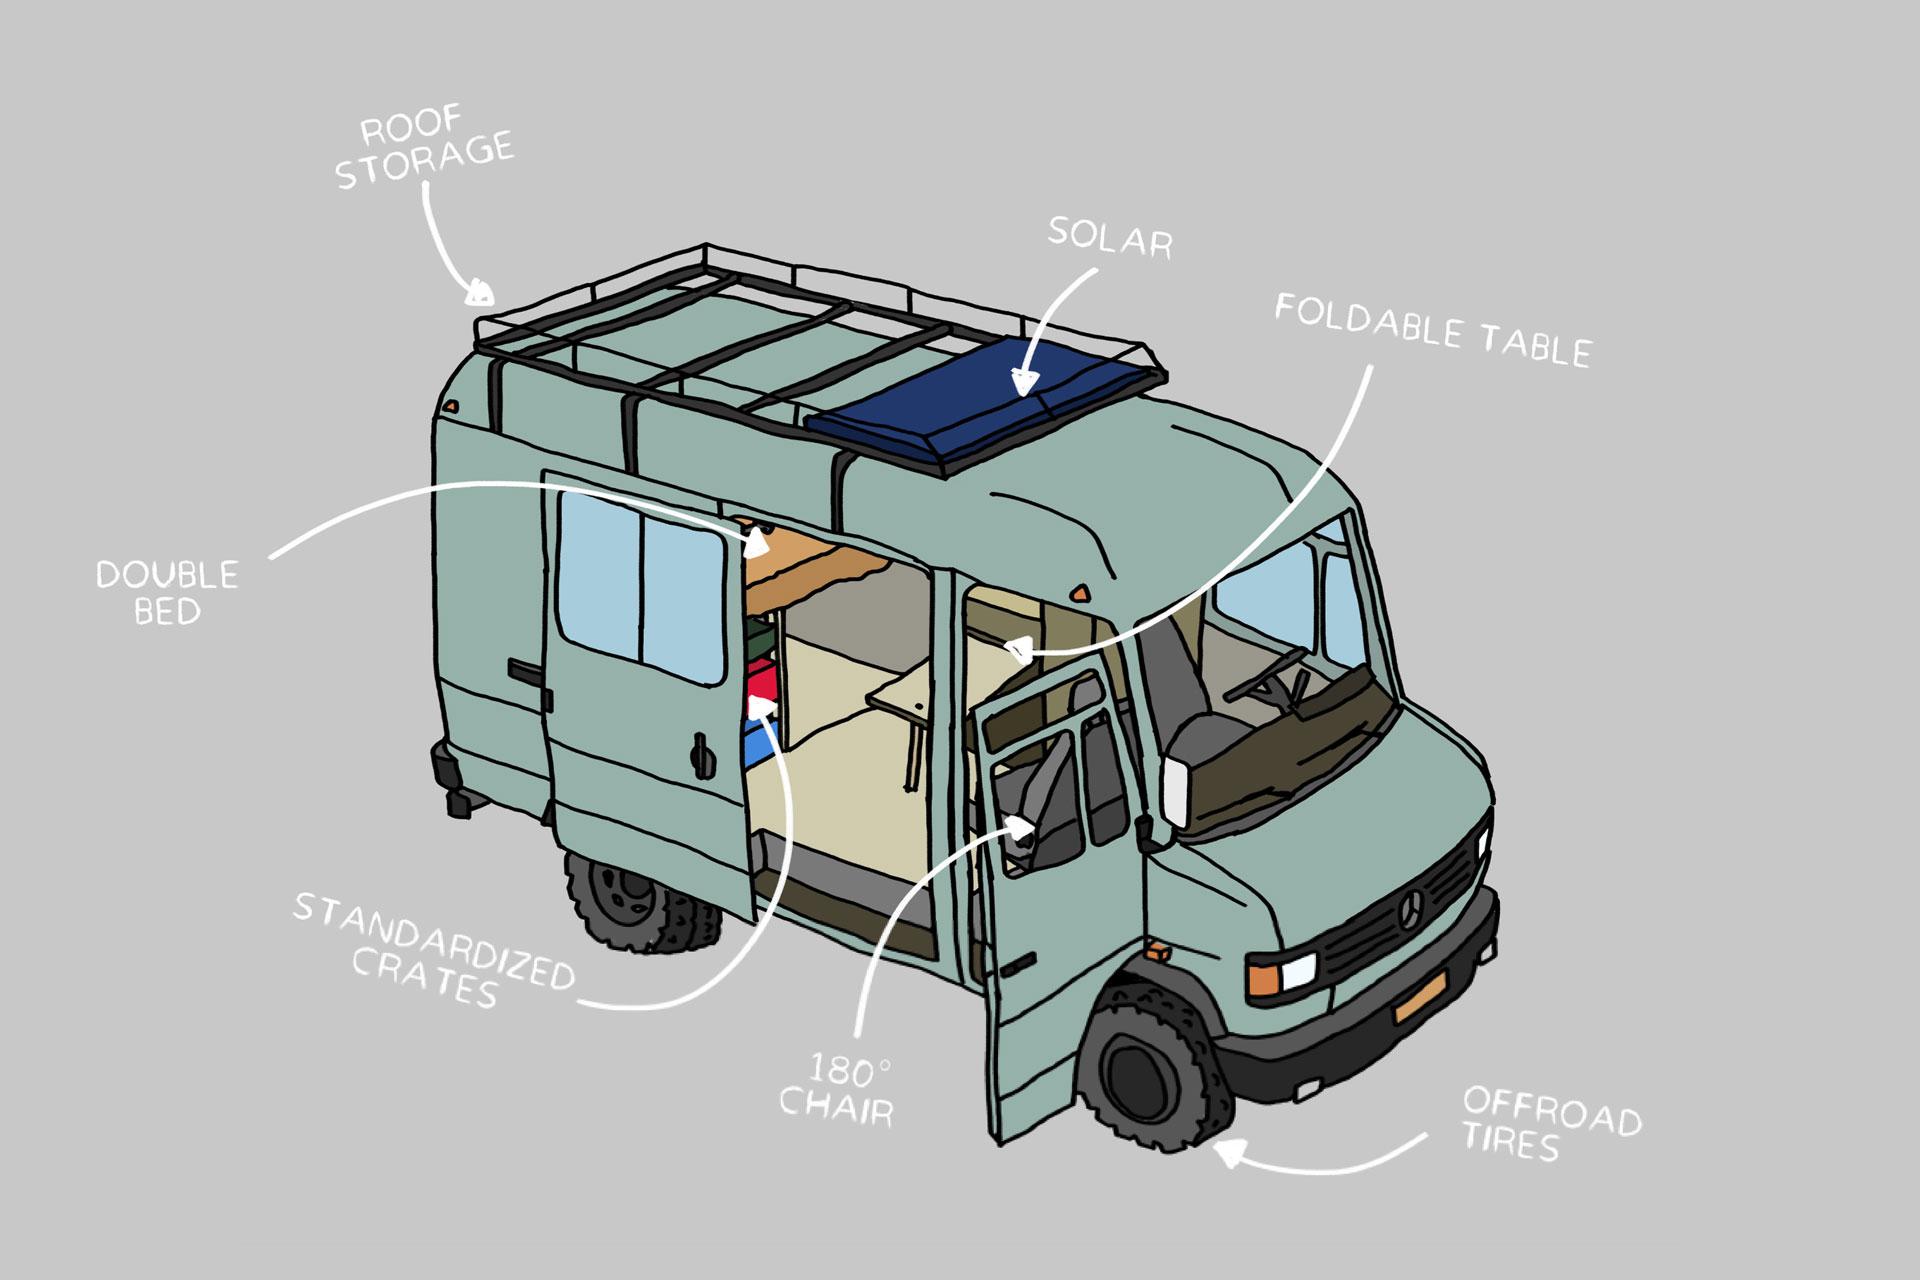 Illustration of a converted van